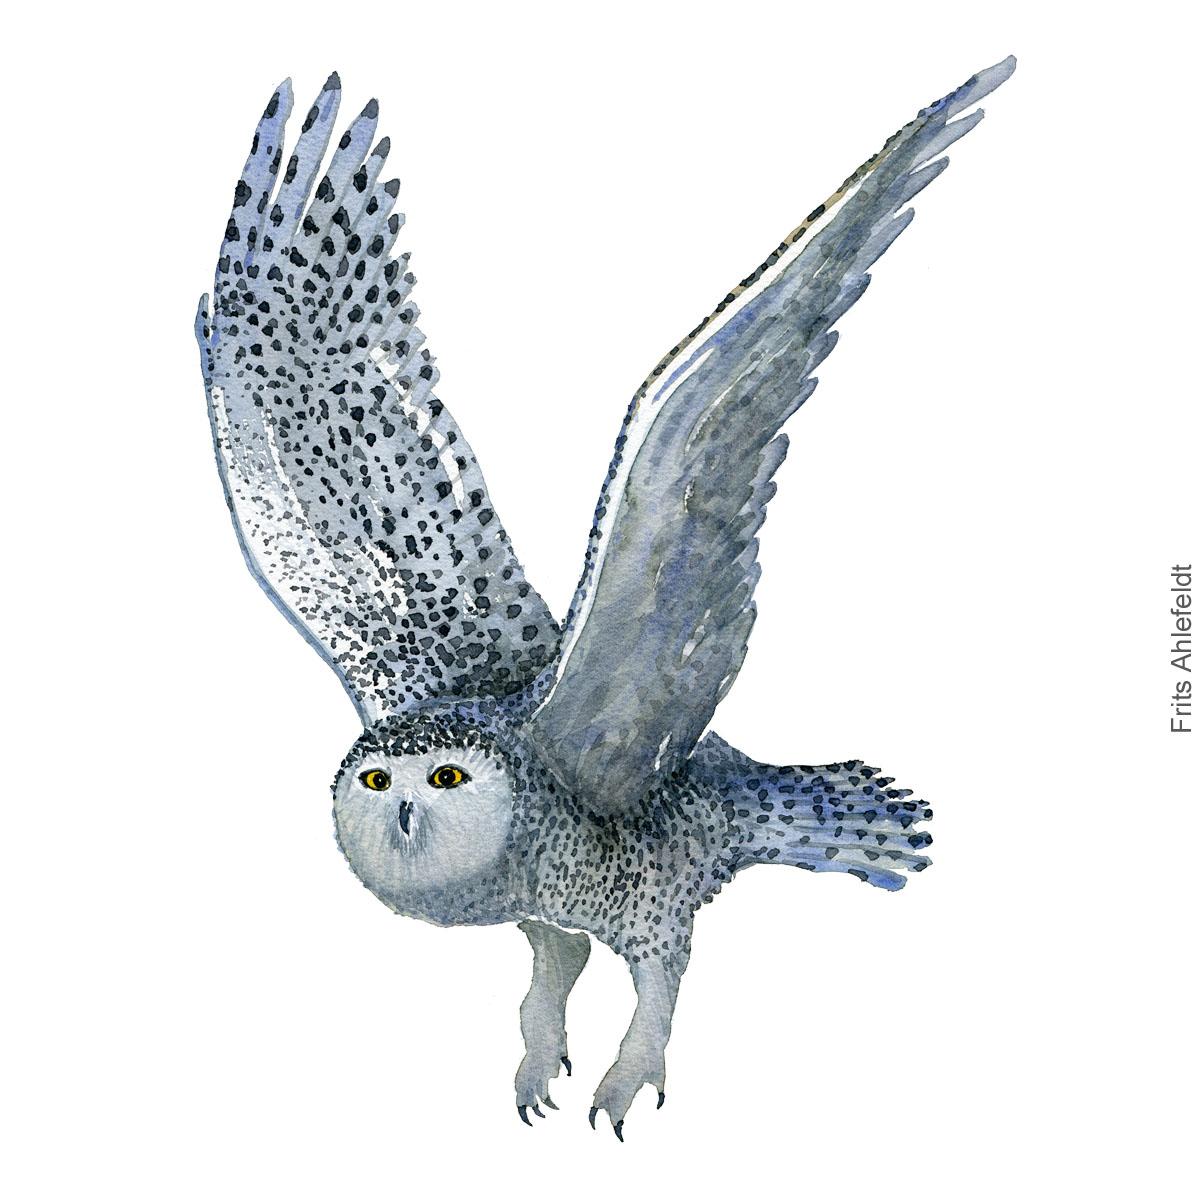 Sneugle - Snowy owl flying - Bird watercolor painting. Artwork by Frits Ahlefeldt. Fugle akvarel